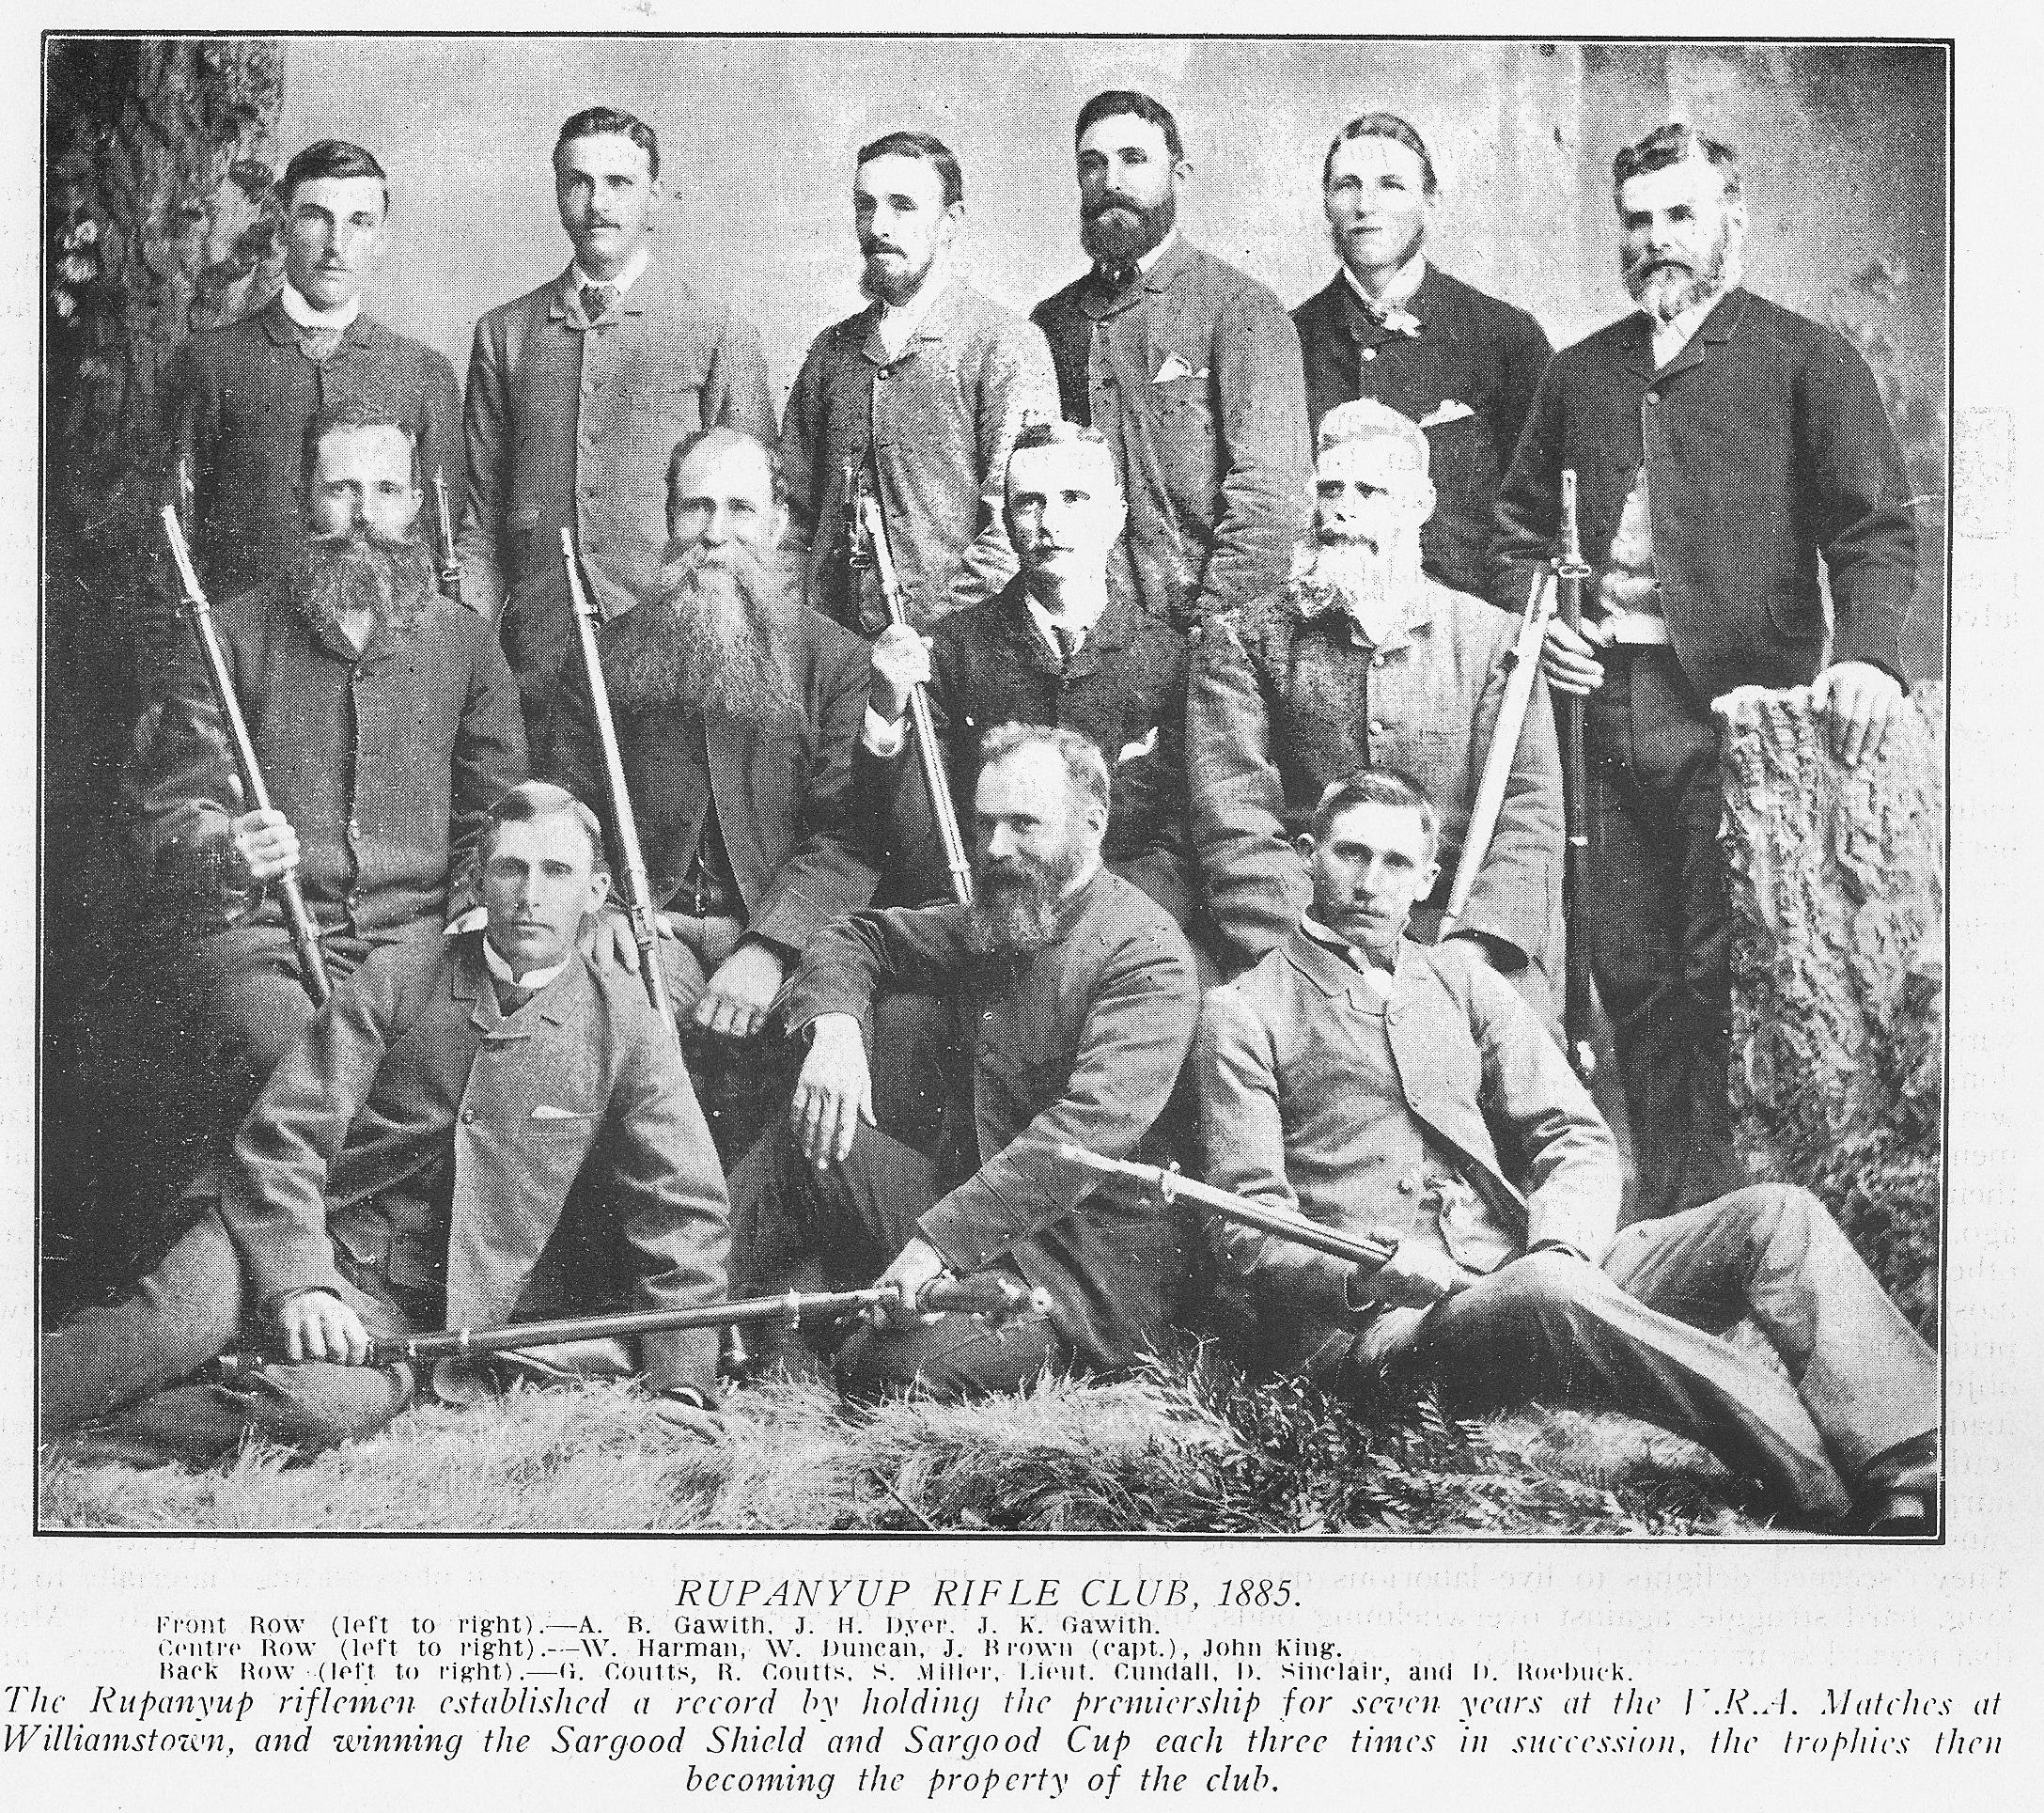 Image courtesy of the Rupanyup Historical Society.